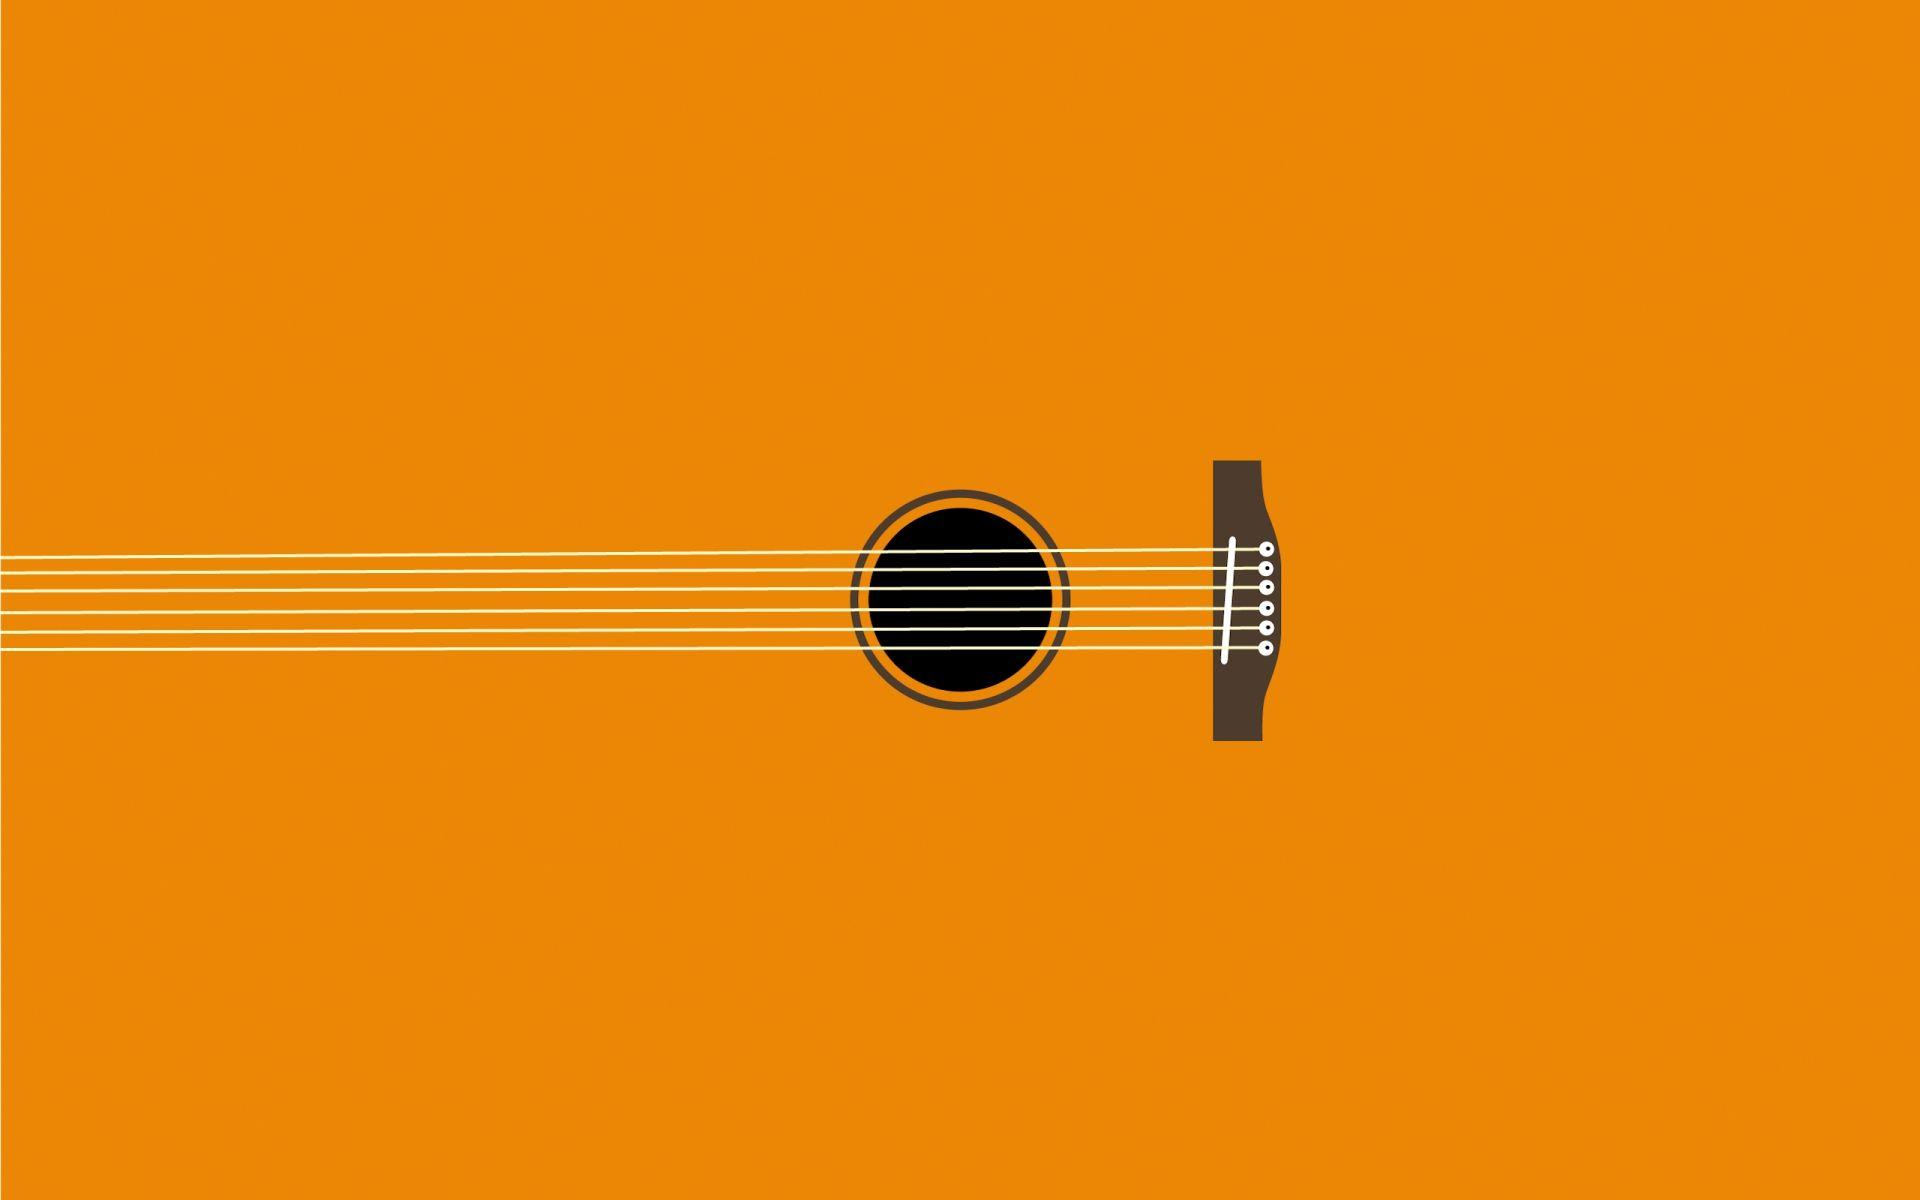 Guitar Abstract, New Wallpaper